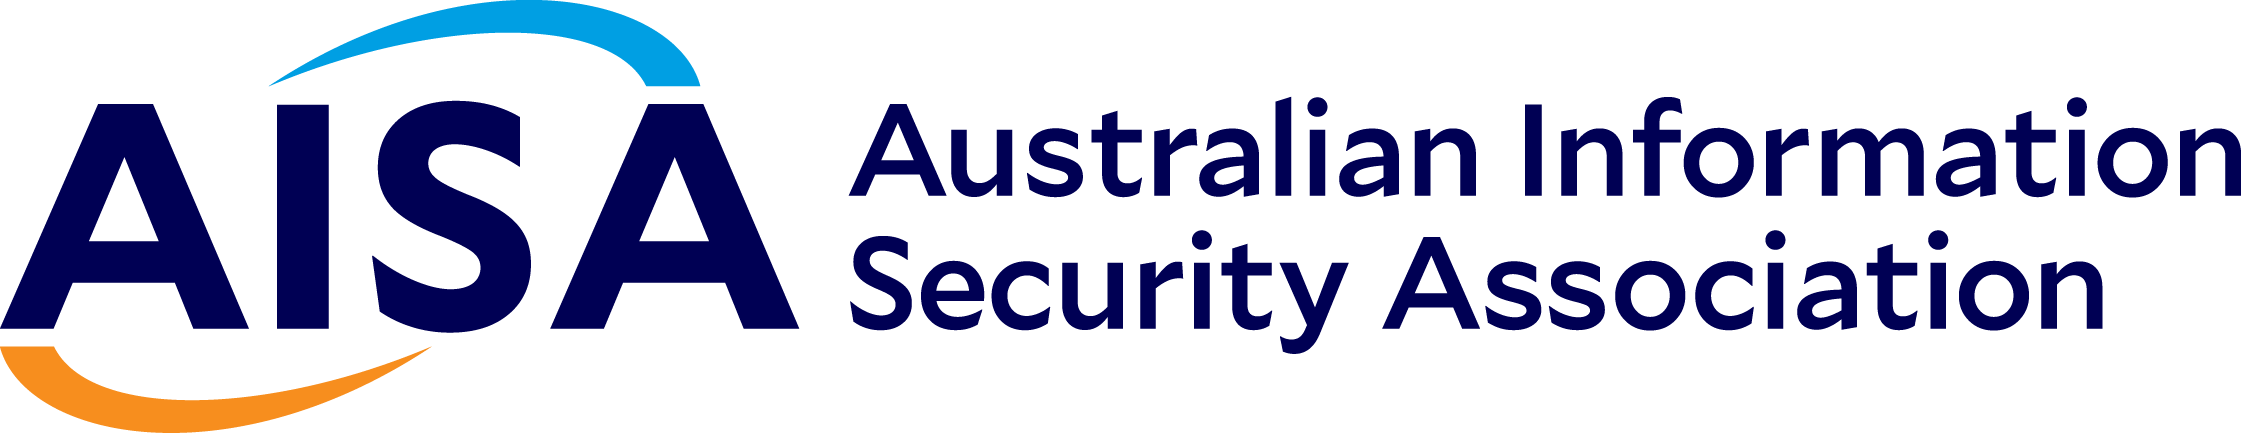 Logo di Australian Information Security Association (AISA)